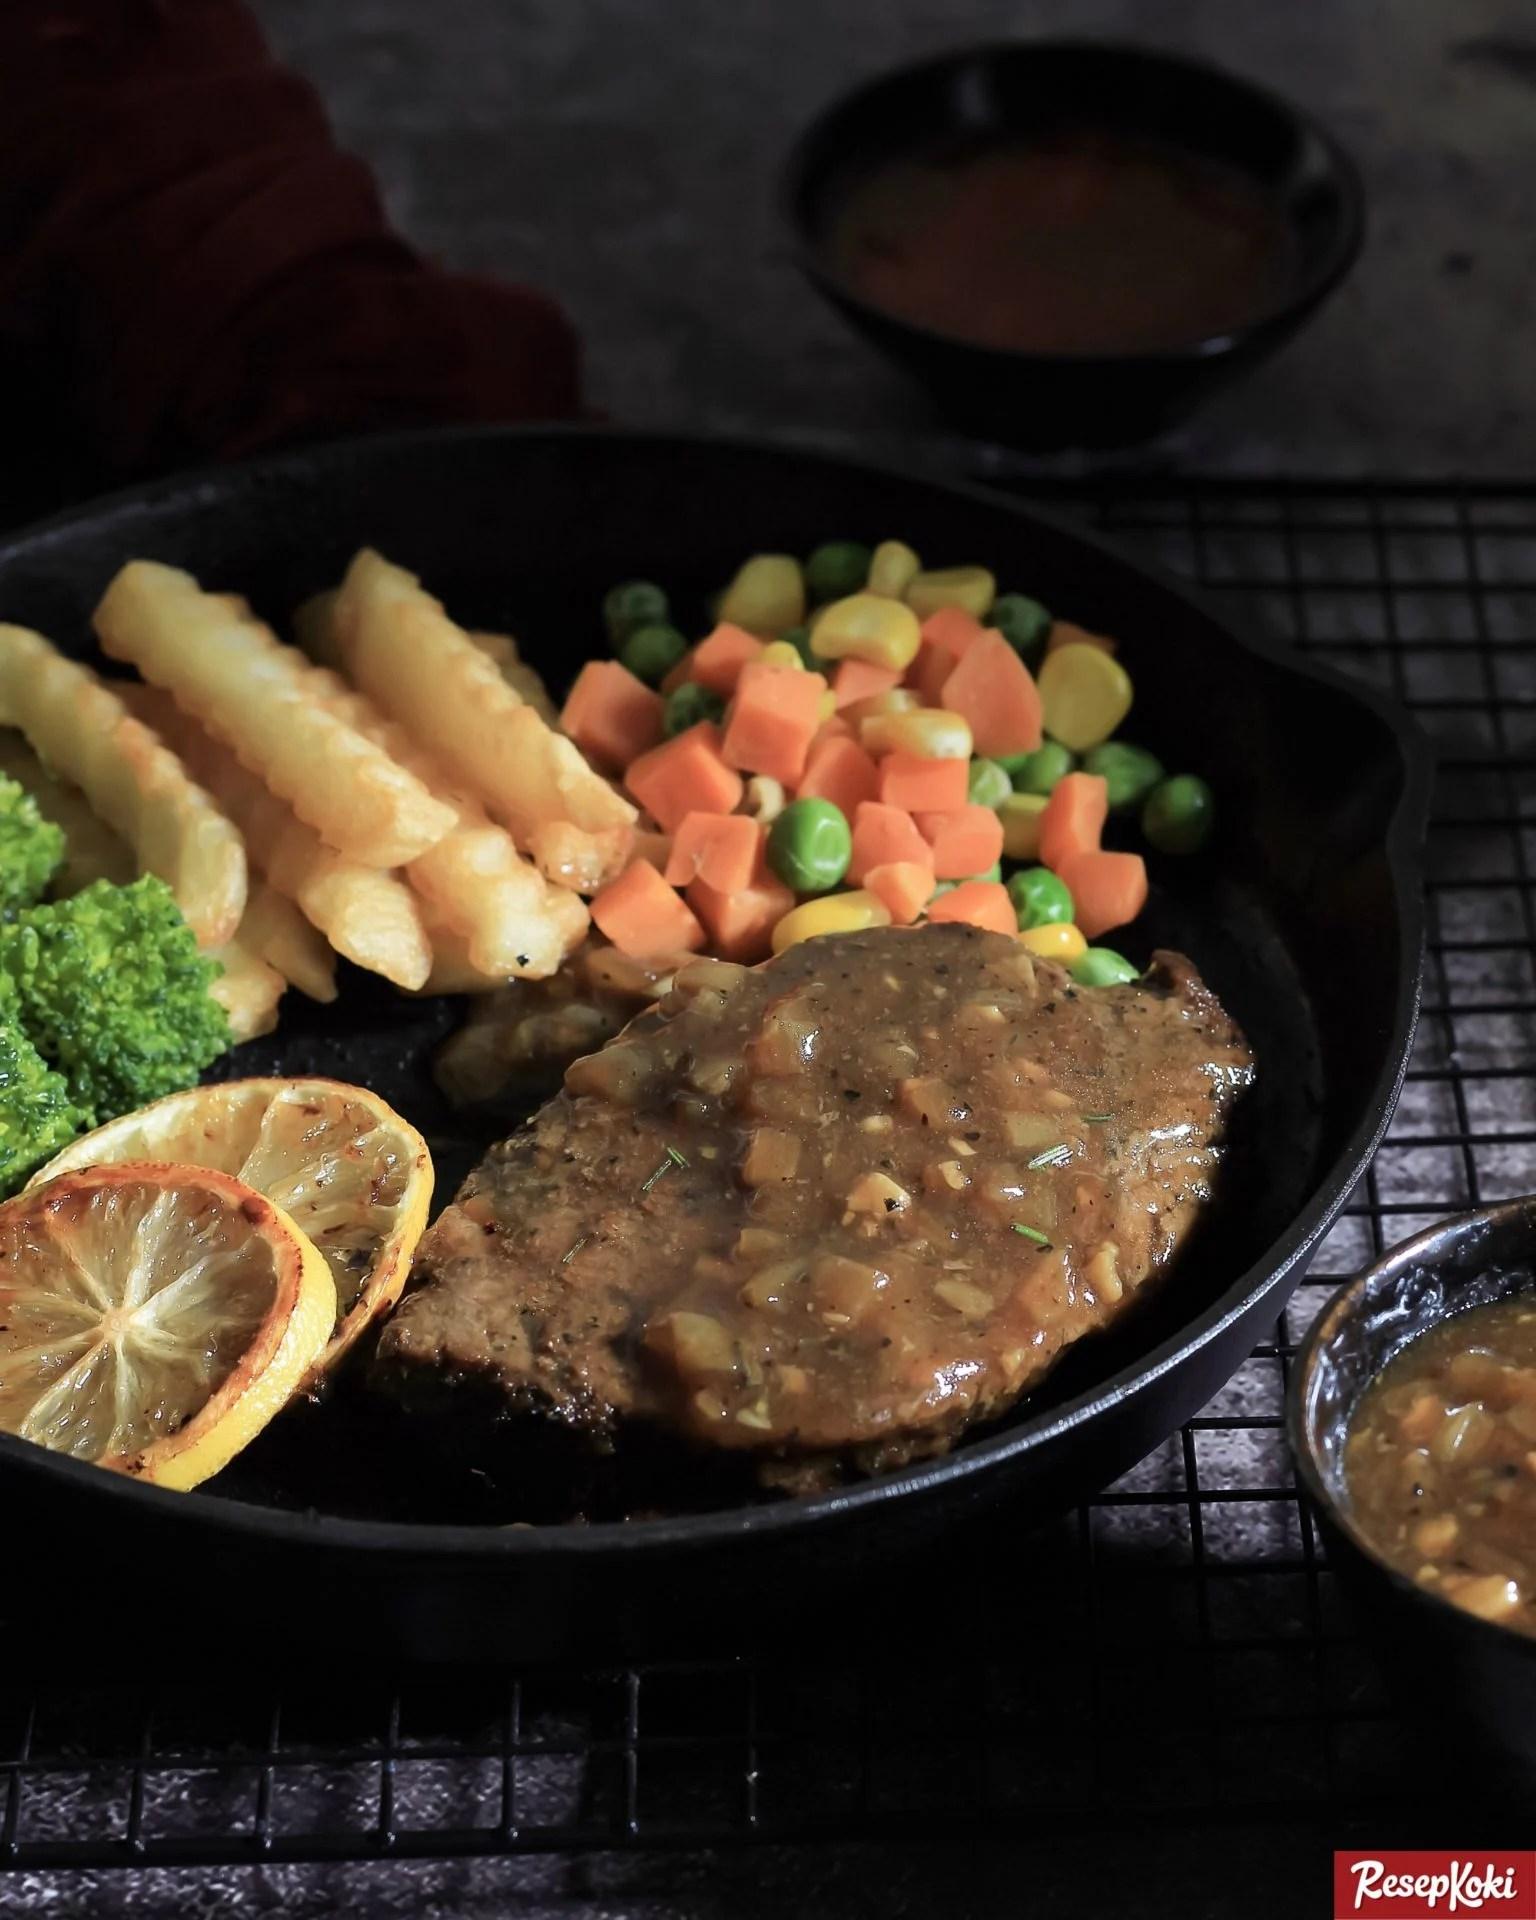 Resep Saus Steak : resep, steak, Steak, Tenderloin, Blackpepper, Istimewa, Resep, ResepKoki